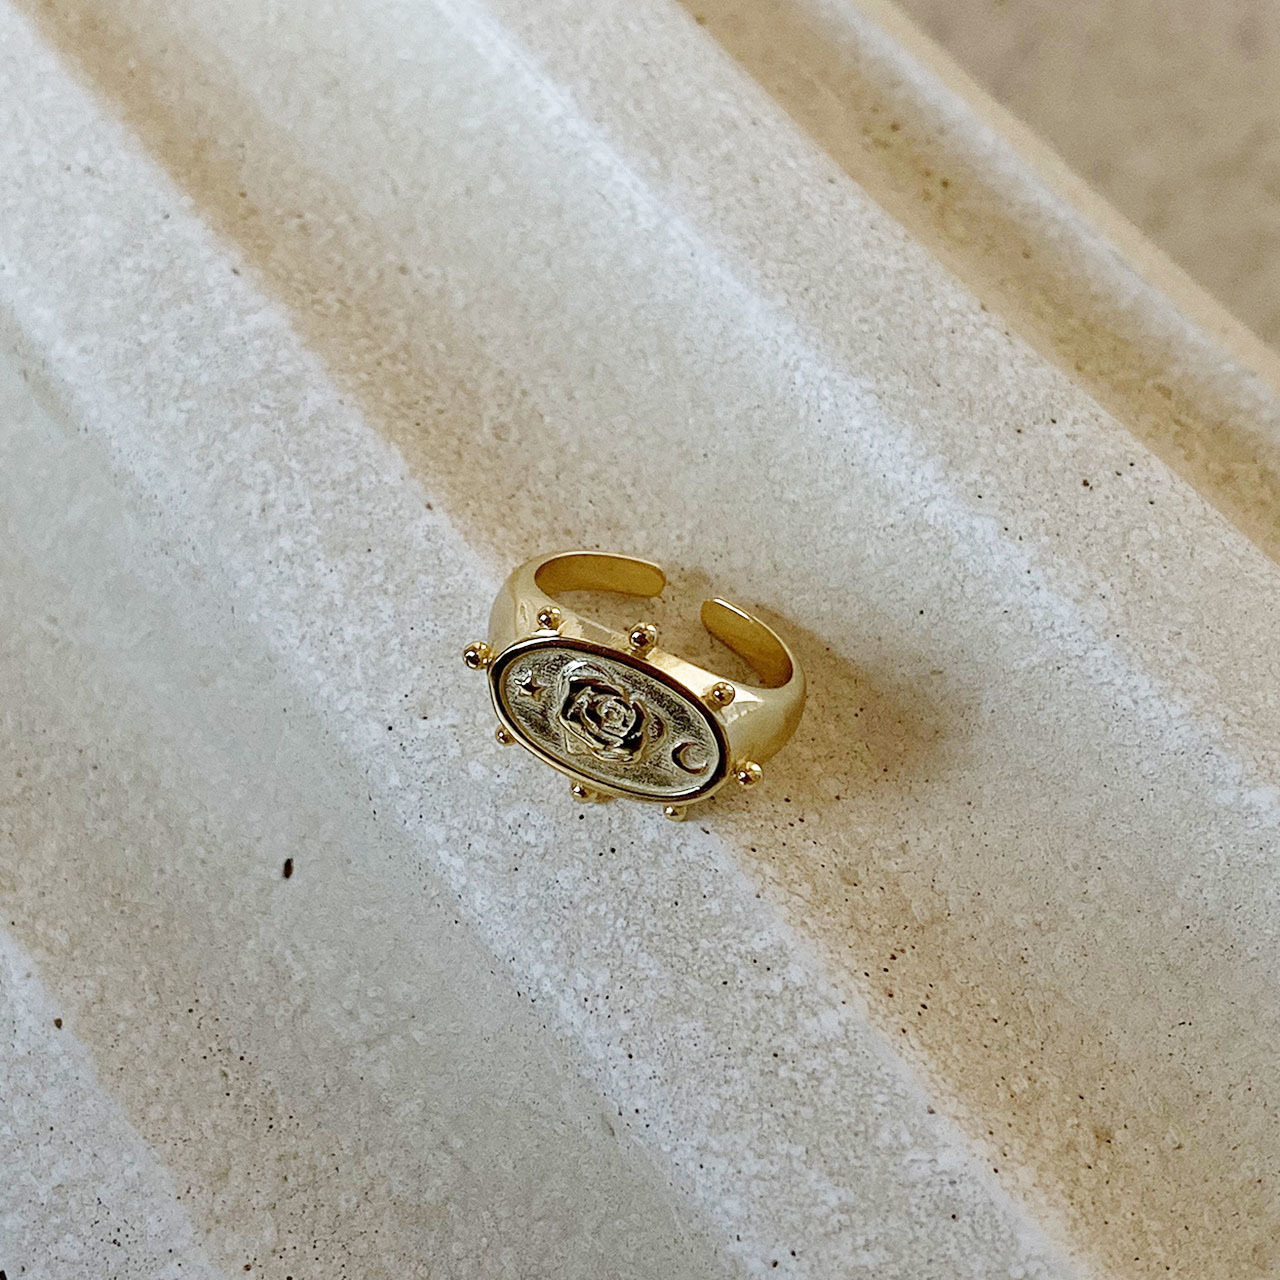 925 Sterling Silver Rings For Women Gift For Girlfriend Joyas De Anillo Plata Mujer Fine Jewelry Sieraden Bague Femme Argent